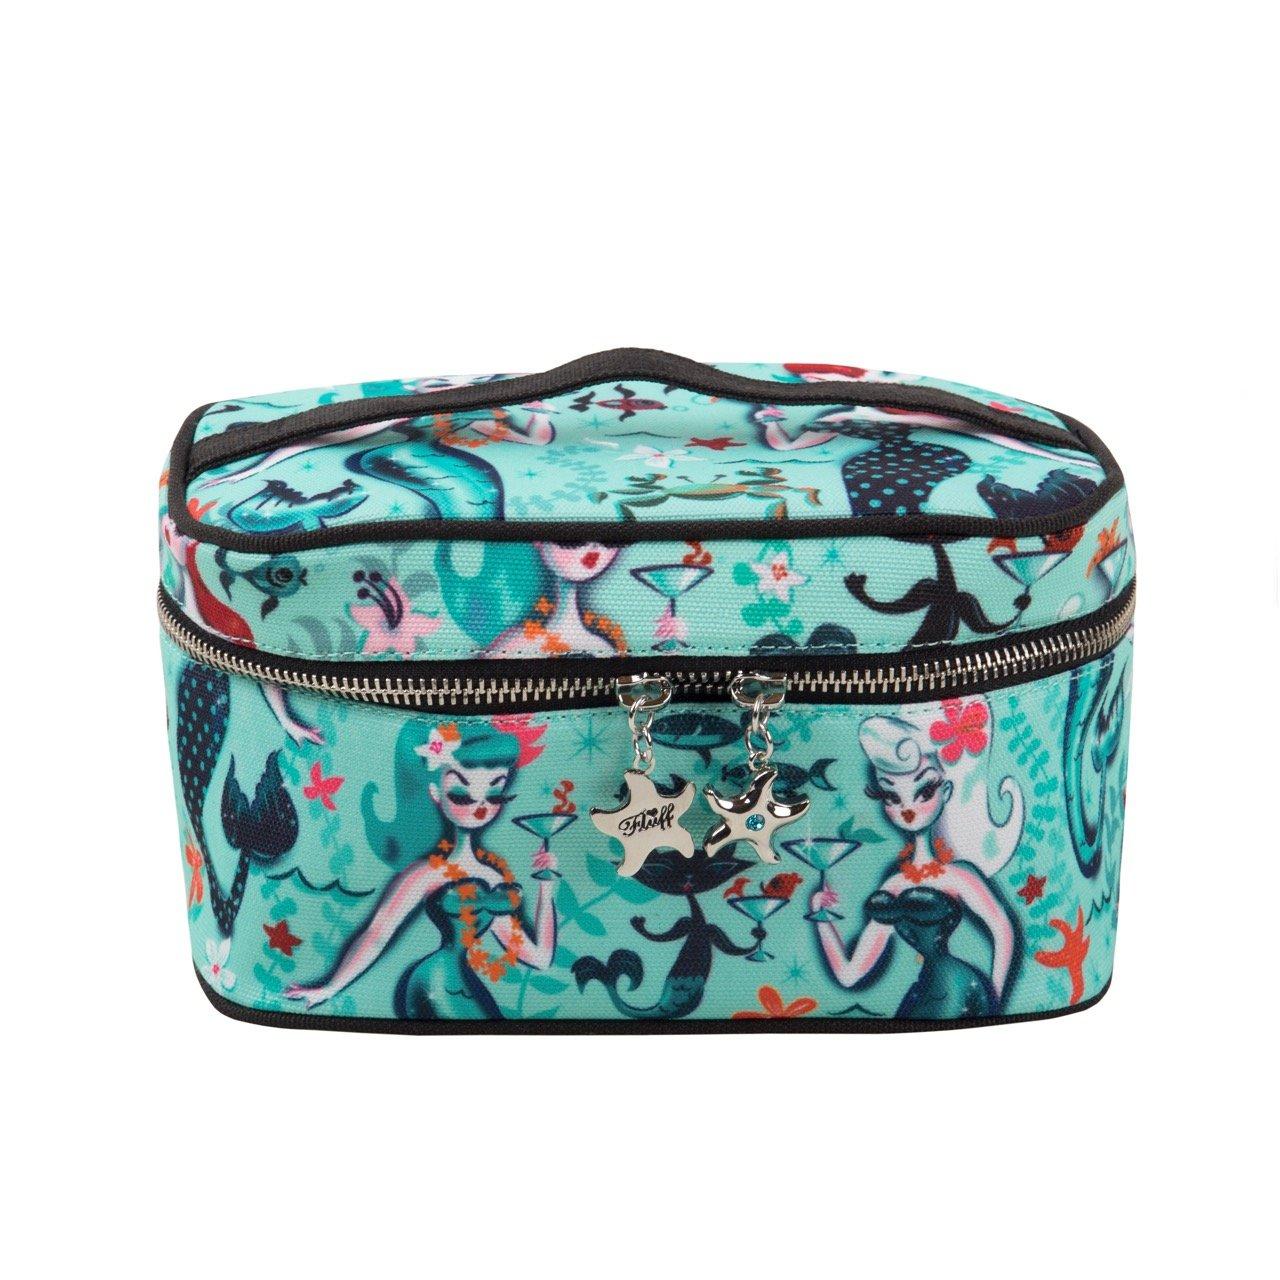 "d208d54ee51e Large Cosmetic Zipper Makeup Bag Train Case with Retro Boudoir ""Martini  Mermaid"" Pattern -"